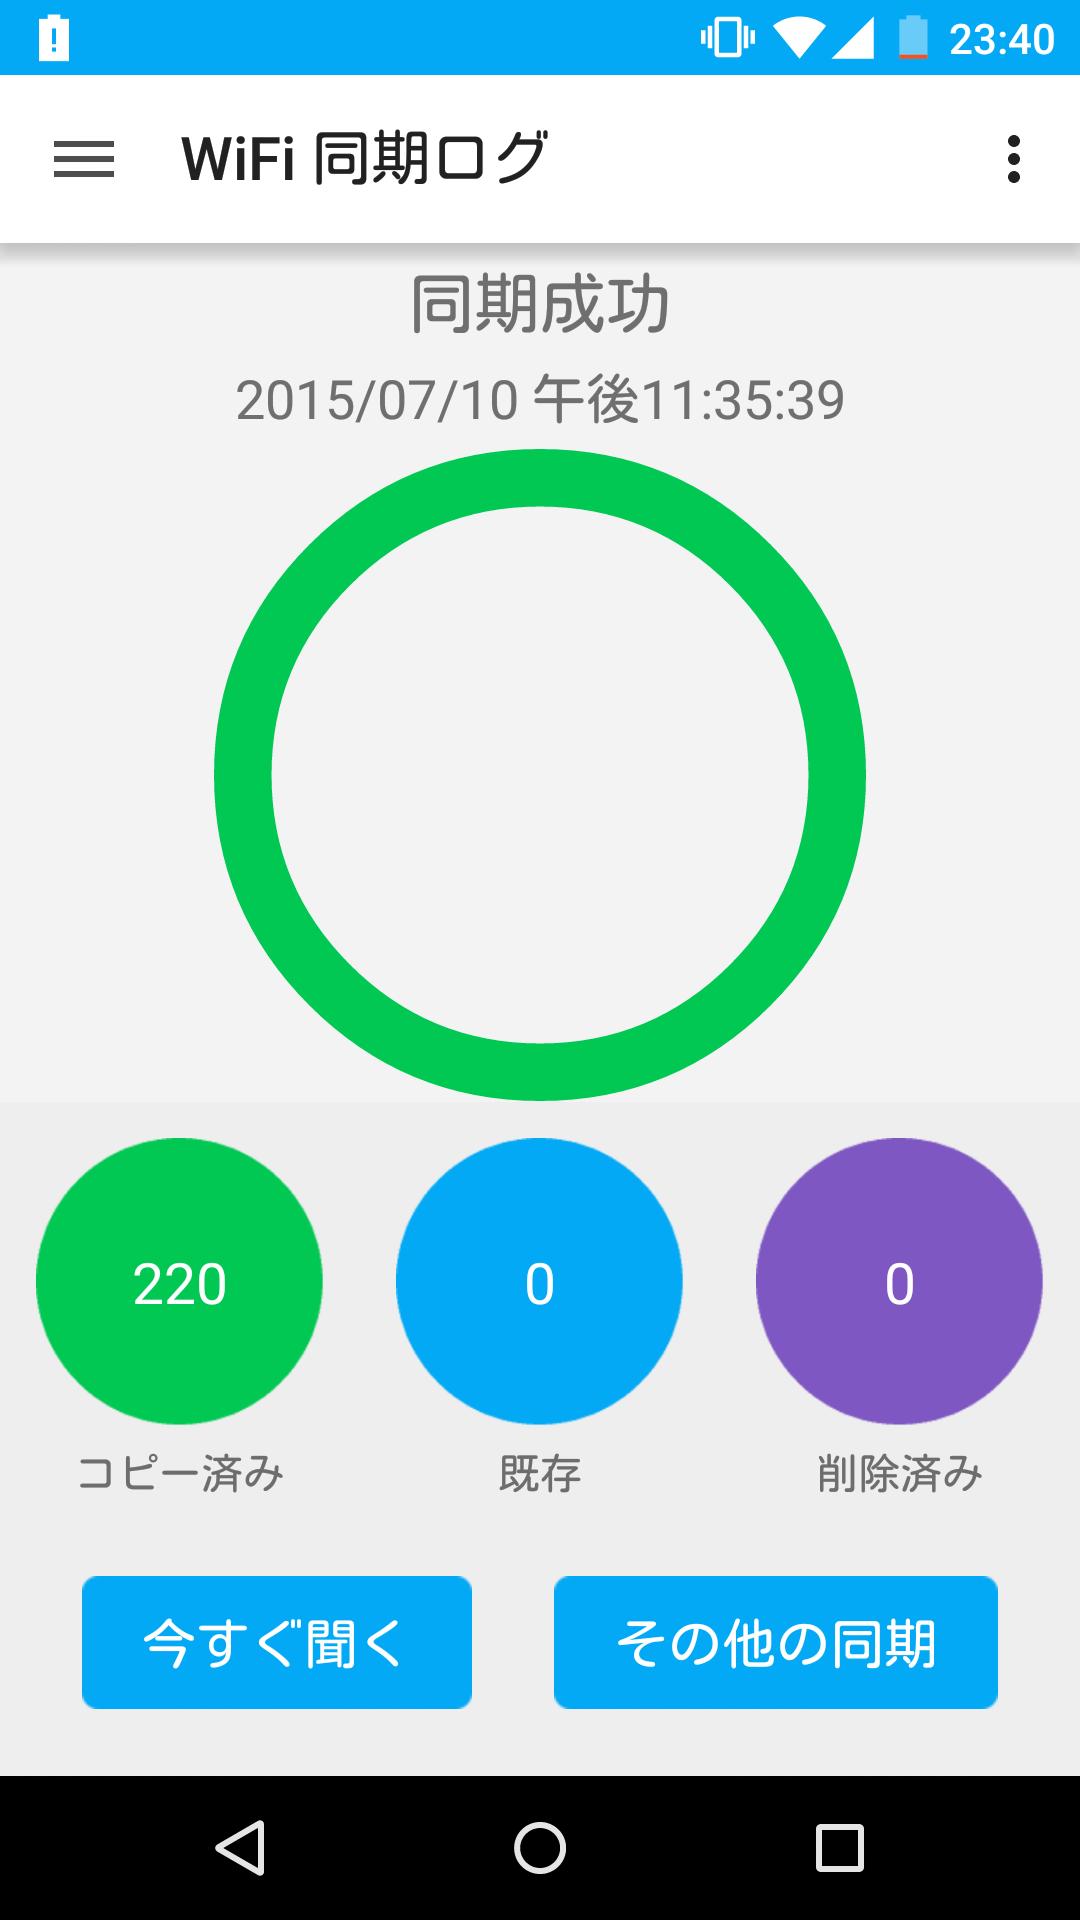 Screenshot_2015-07-10-23-40-45